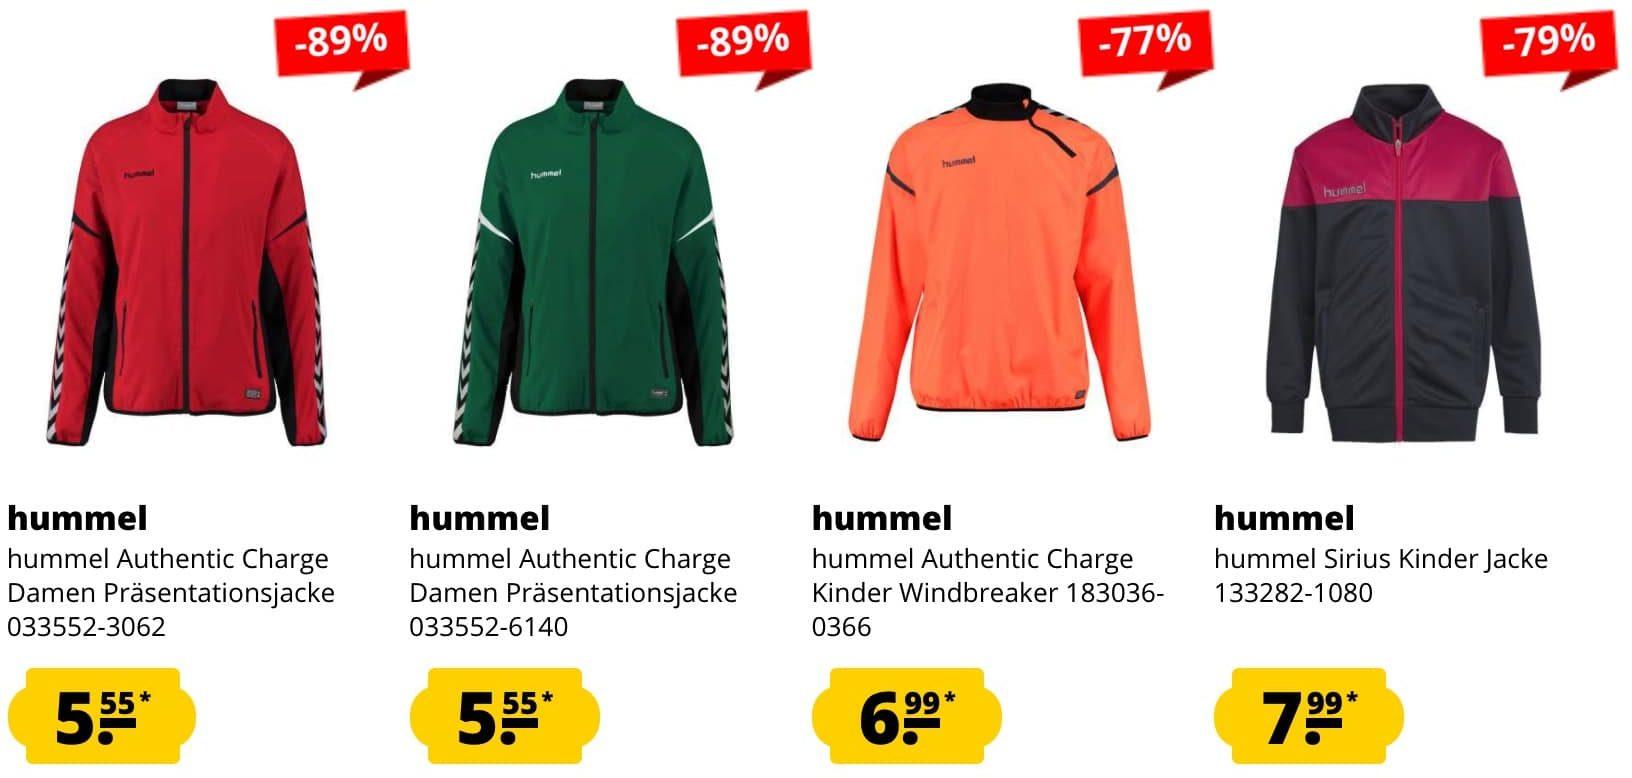 Hummel Praesentationsjacken sportspar  e1628076934356